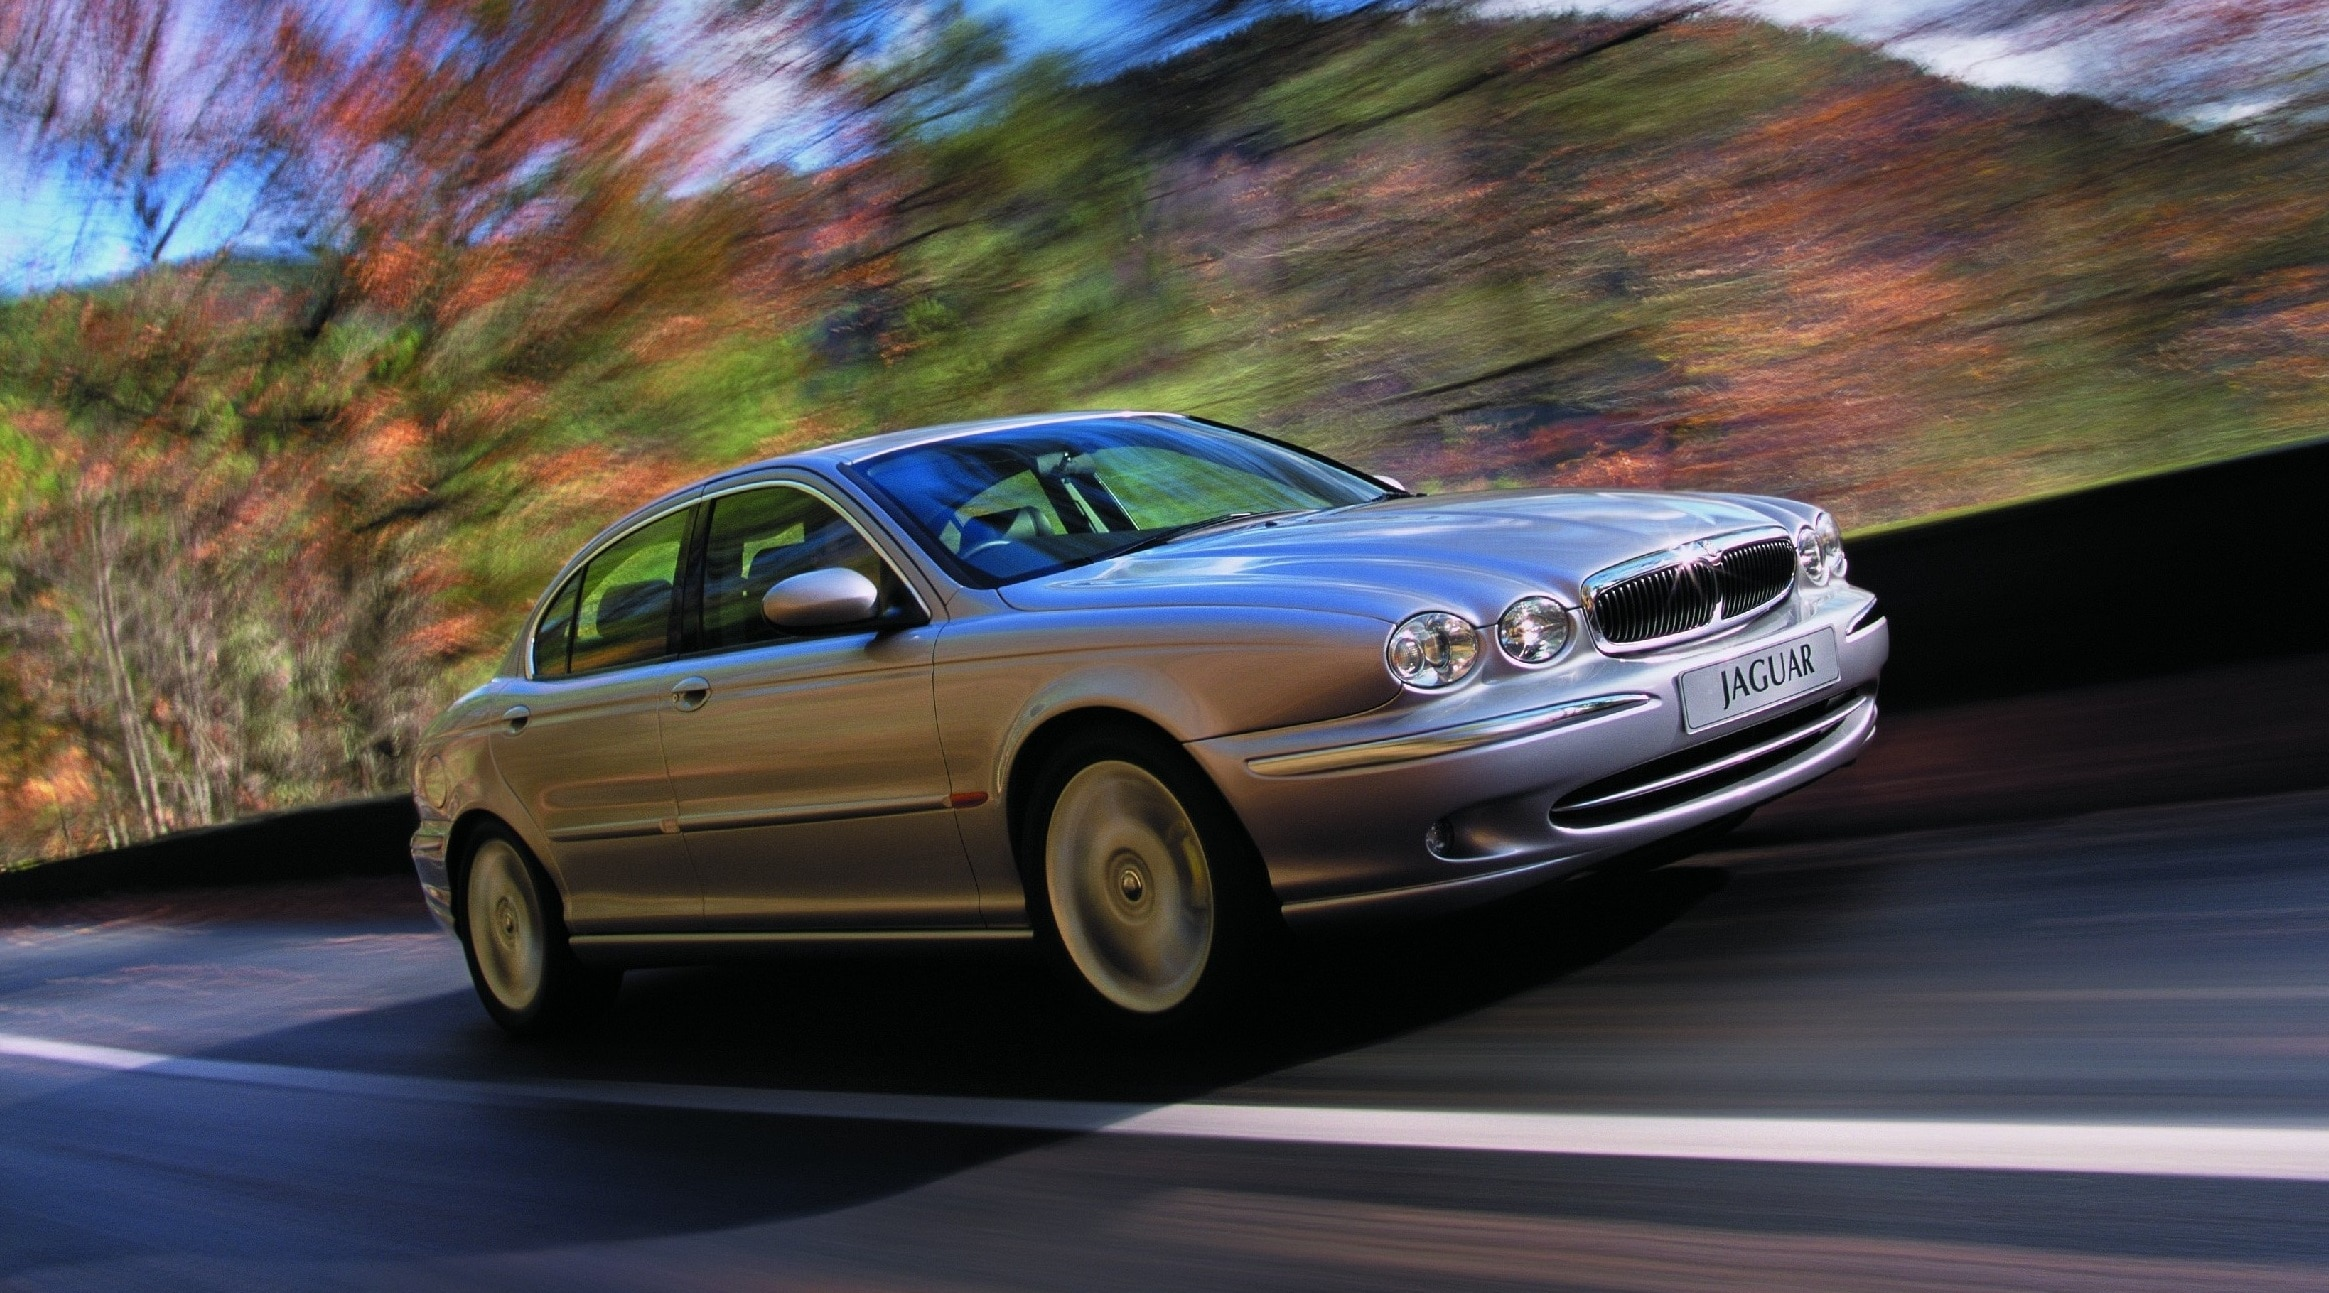 Jaguar X Type, Jaguar, X Type, luxury car, Ford, Ford Mondeo, bargain car, motoring, automotive, ebay, ebay motors, autotrader, family car, expensive car, bargain car, car sales, petrol, diesel, AWD, four wheel-drive, 4x4